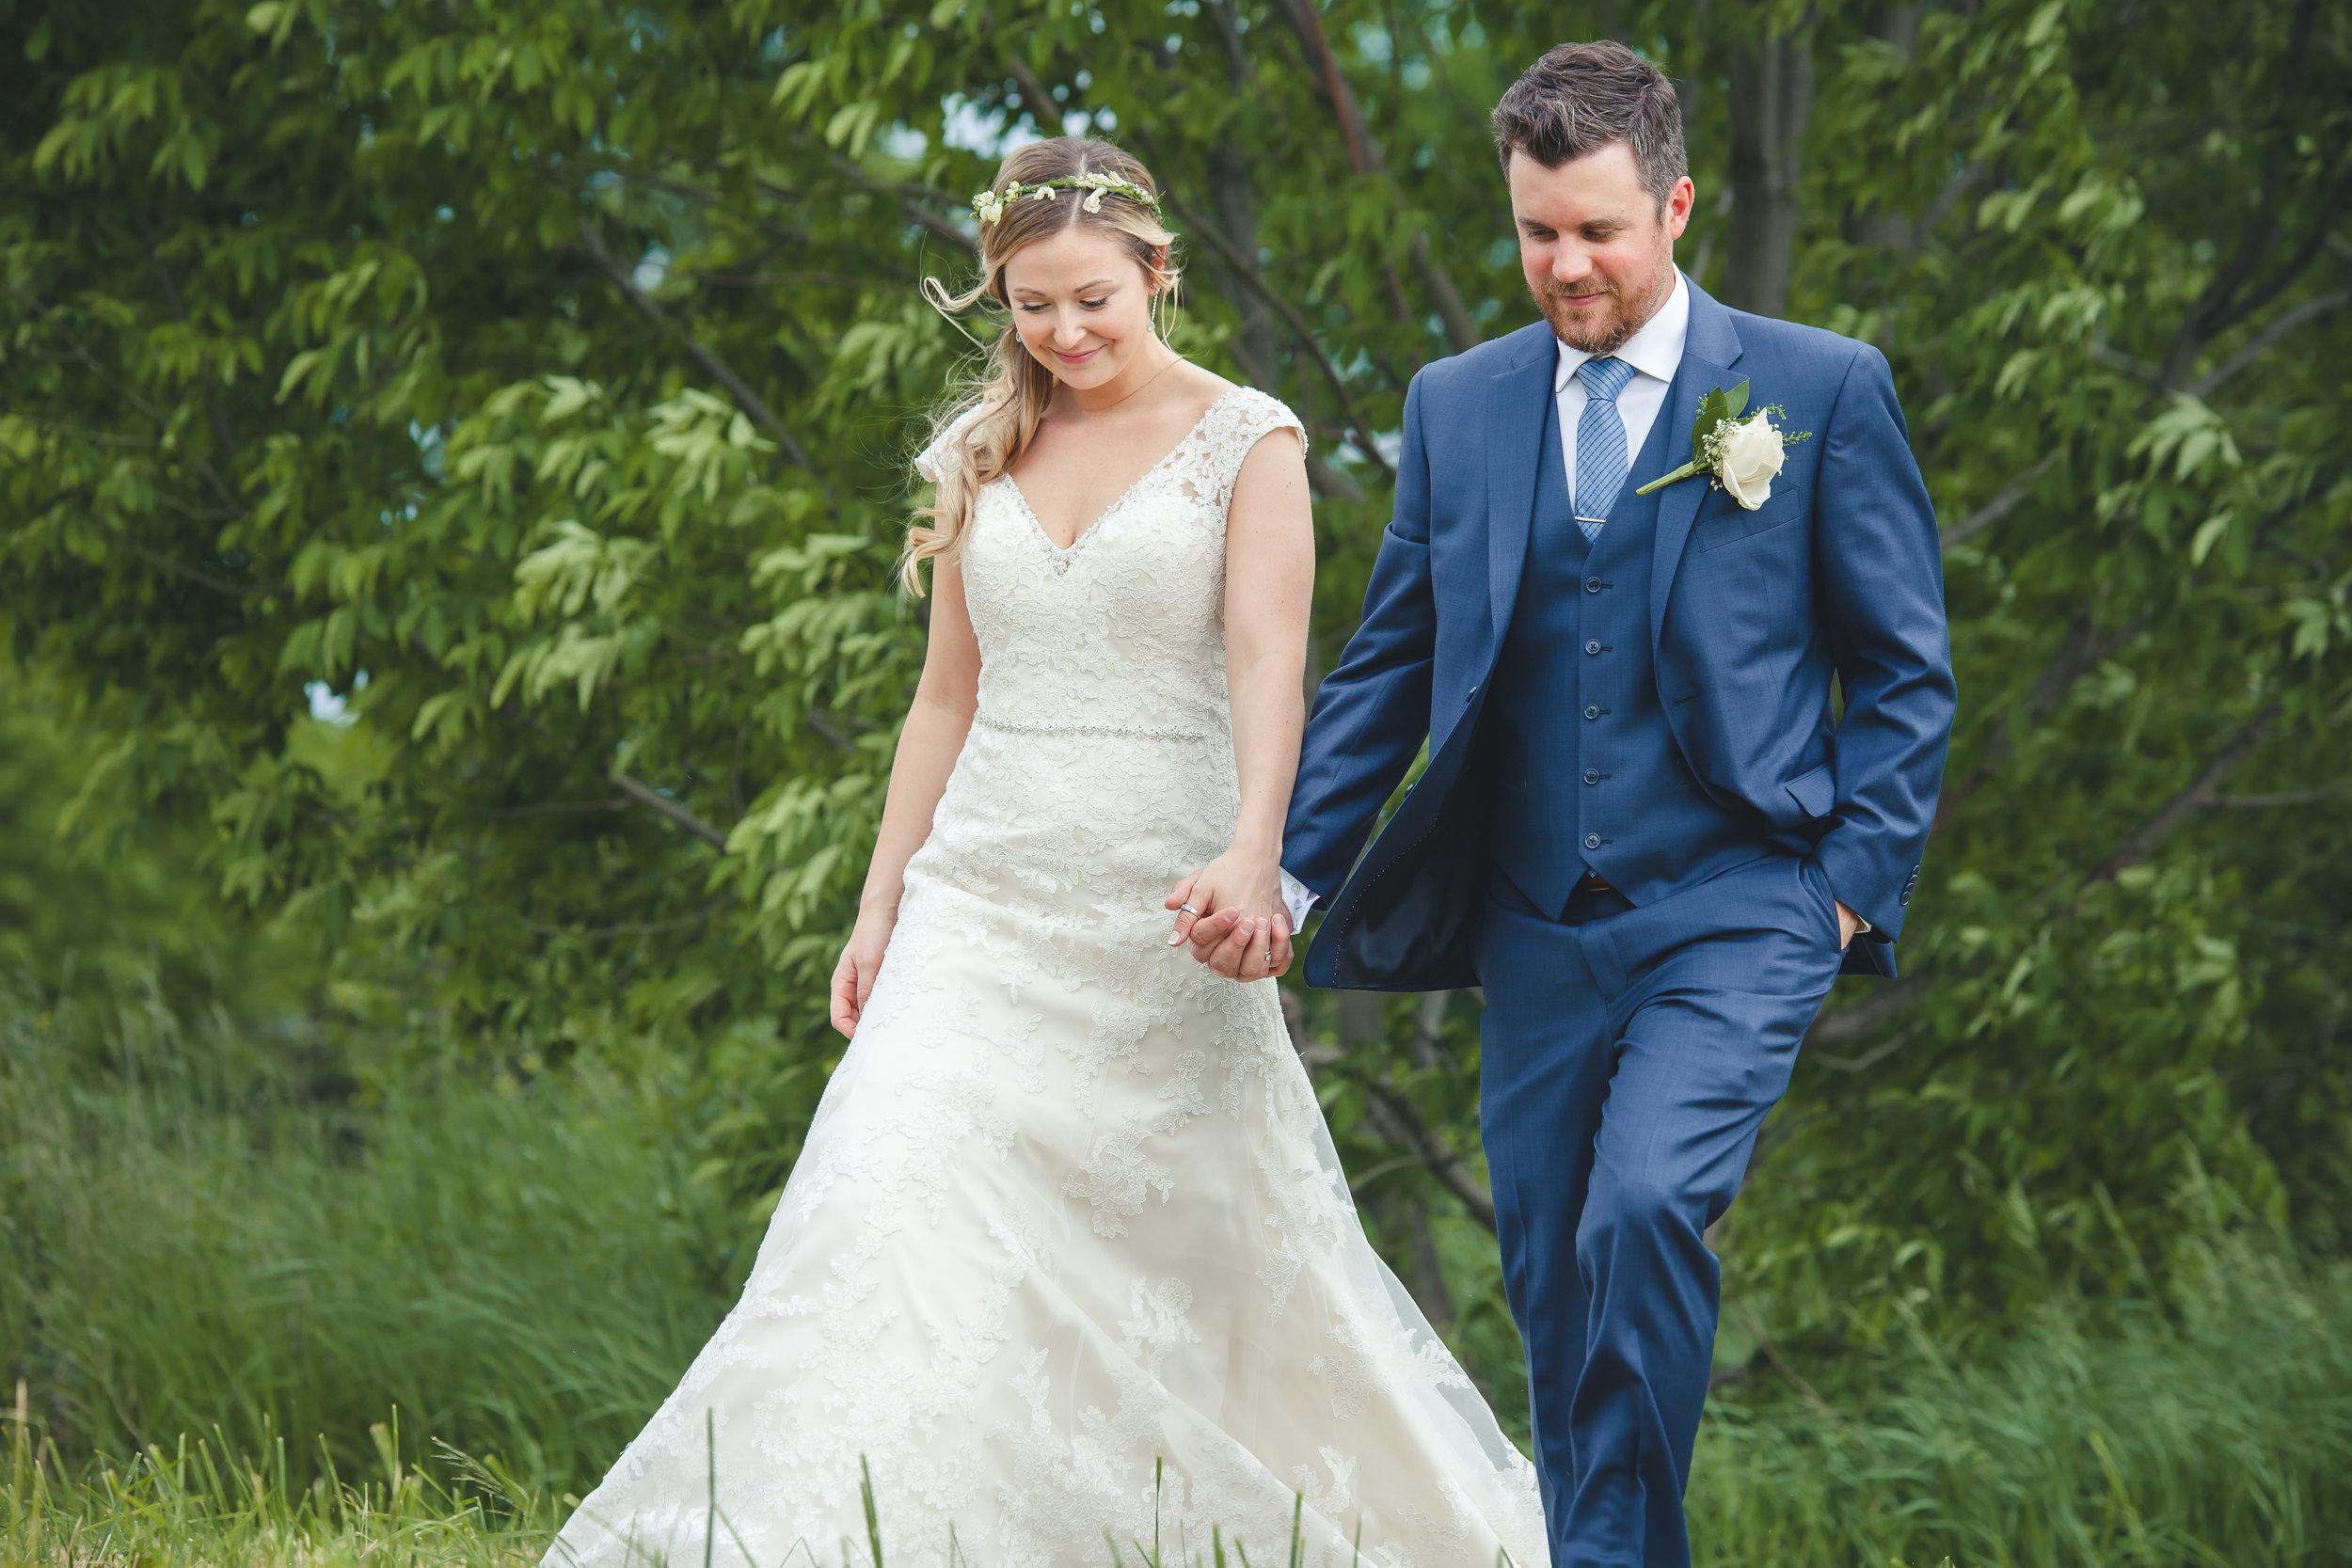 Amy D Photography Barrie and Muskoka Wedding Photography Barrie Country Club_-48.jpg